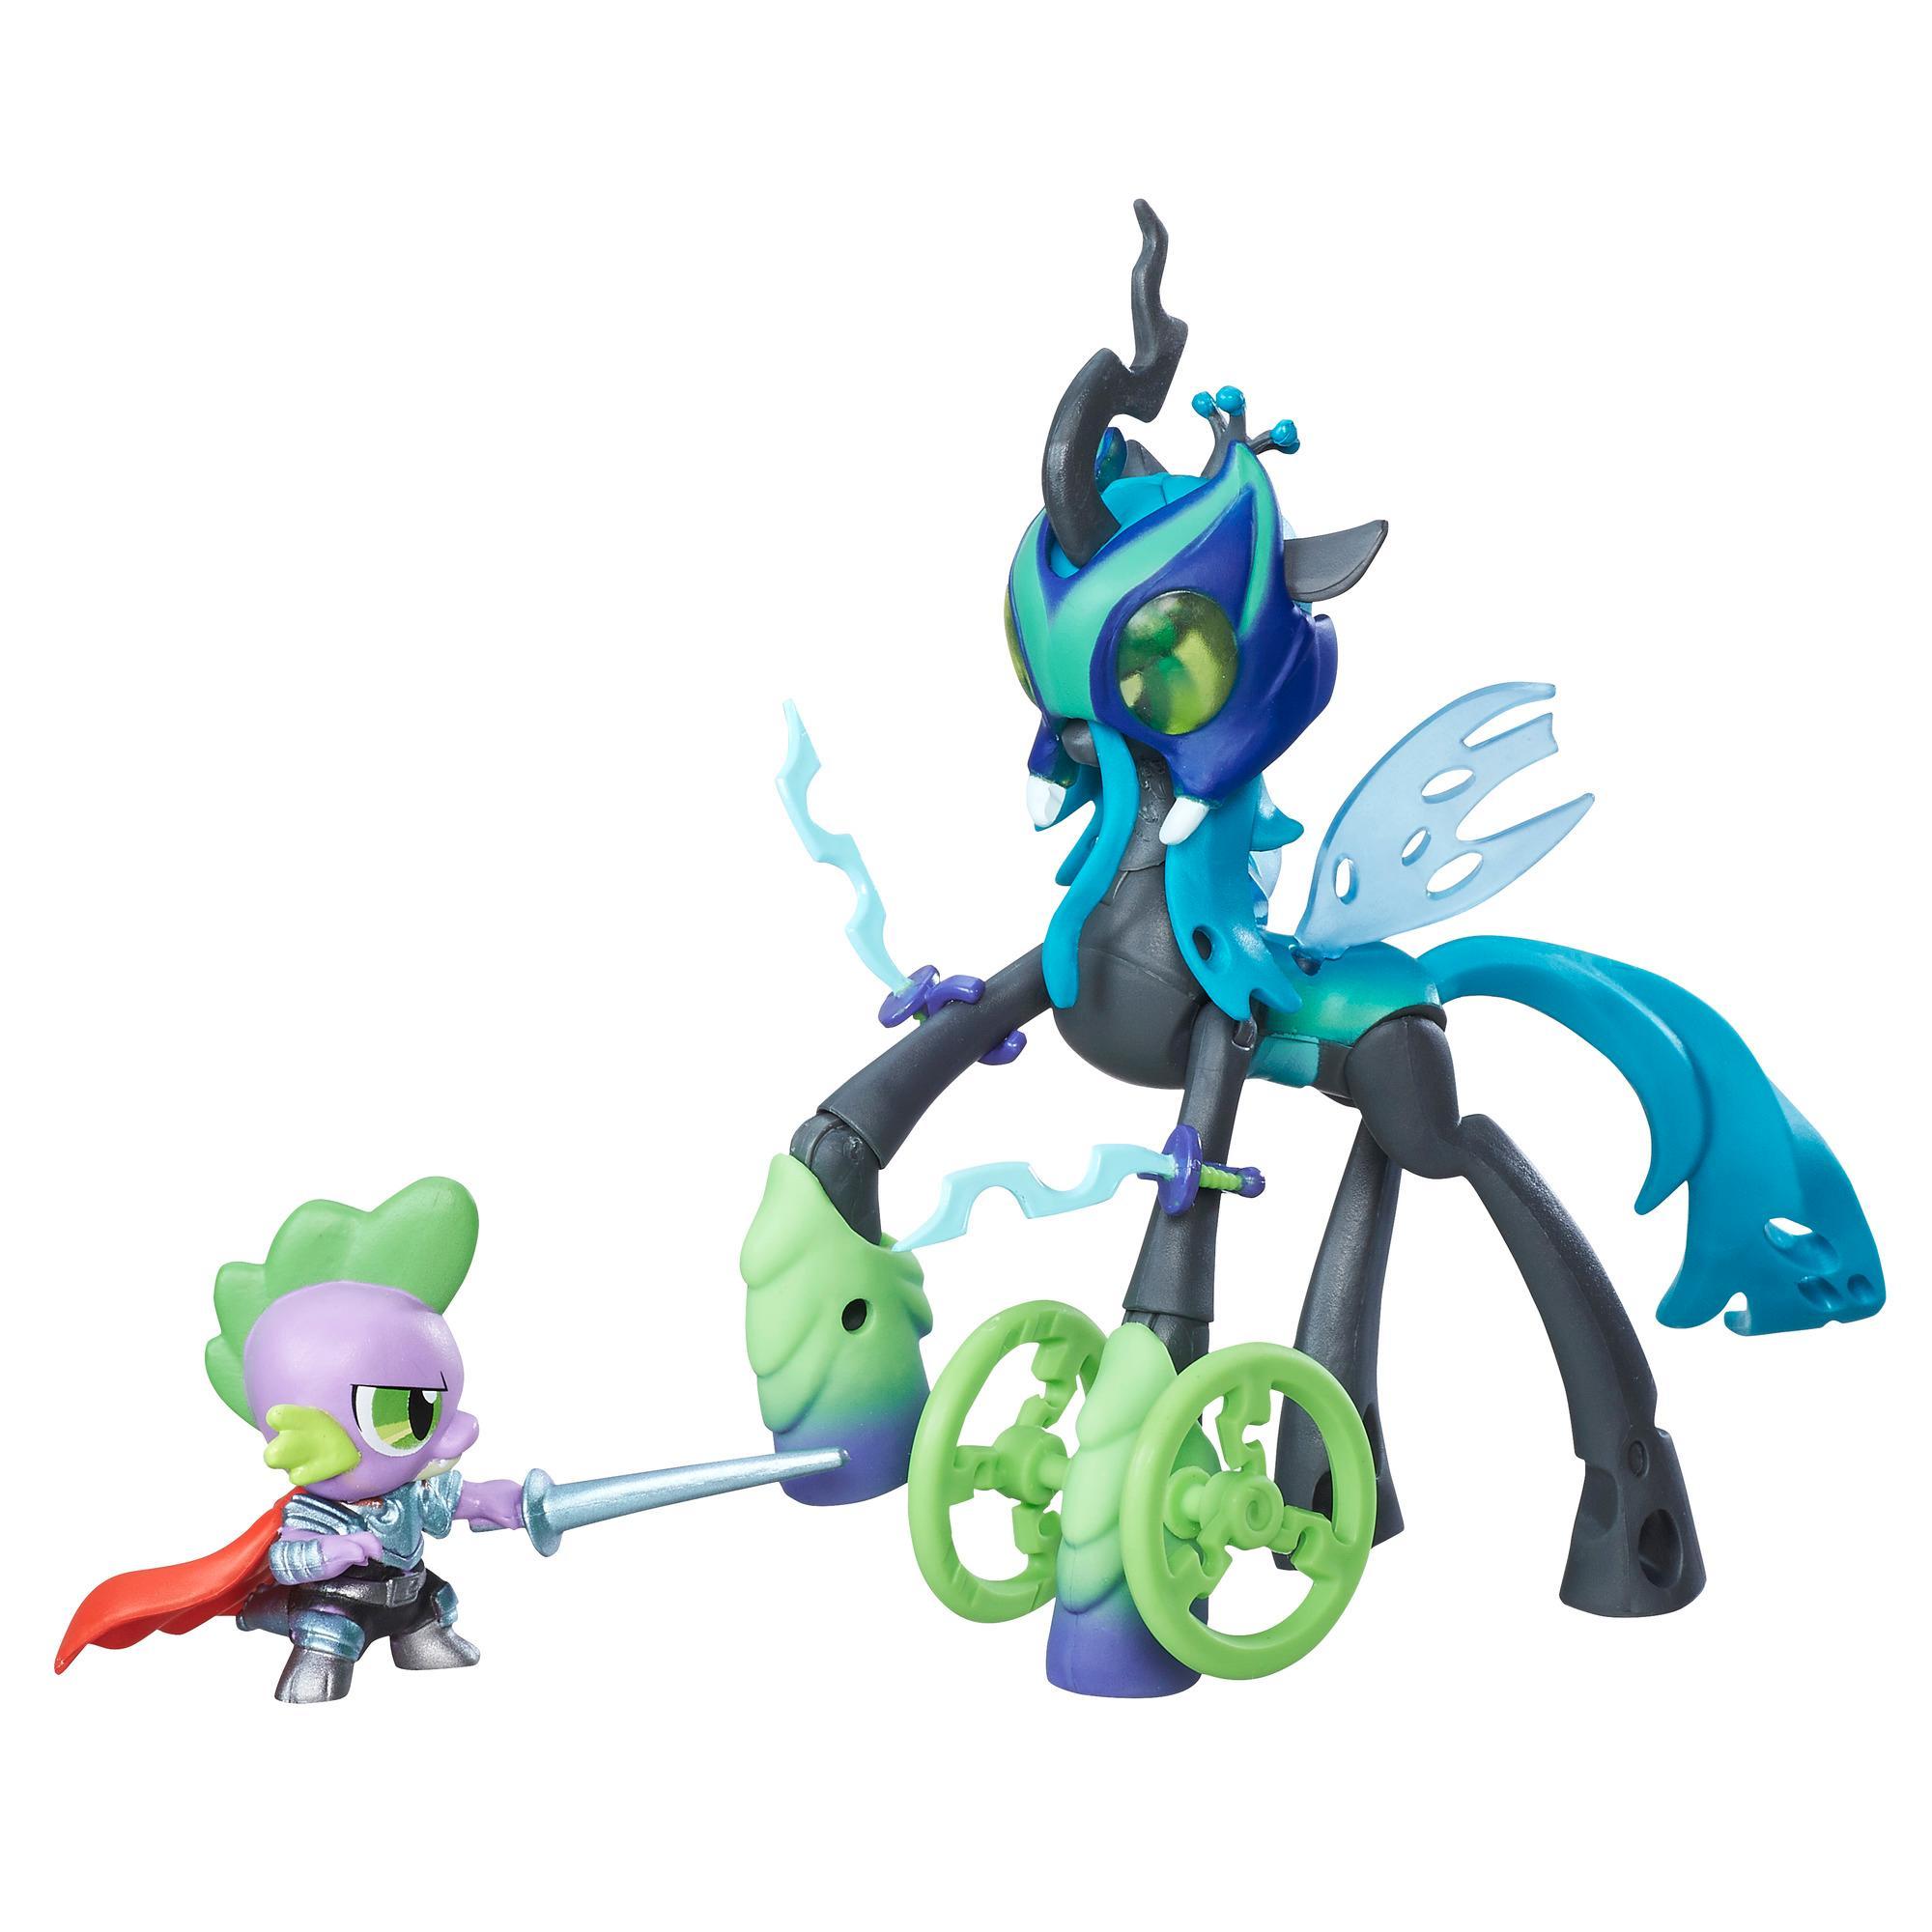 My Little Pony Guardians of Harmony - Спайк и Королева КризалисМоя маленькая пони (My Little Pony)<br>My Little Pony Guardians of Harmony - Спайк и Королева Кризалис<br>